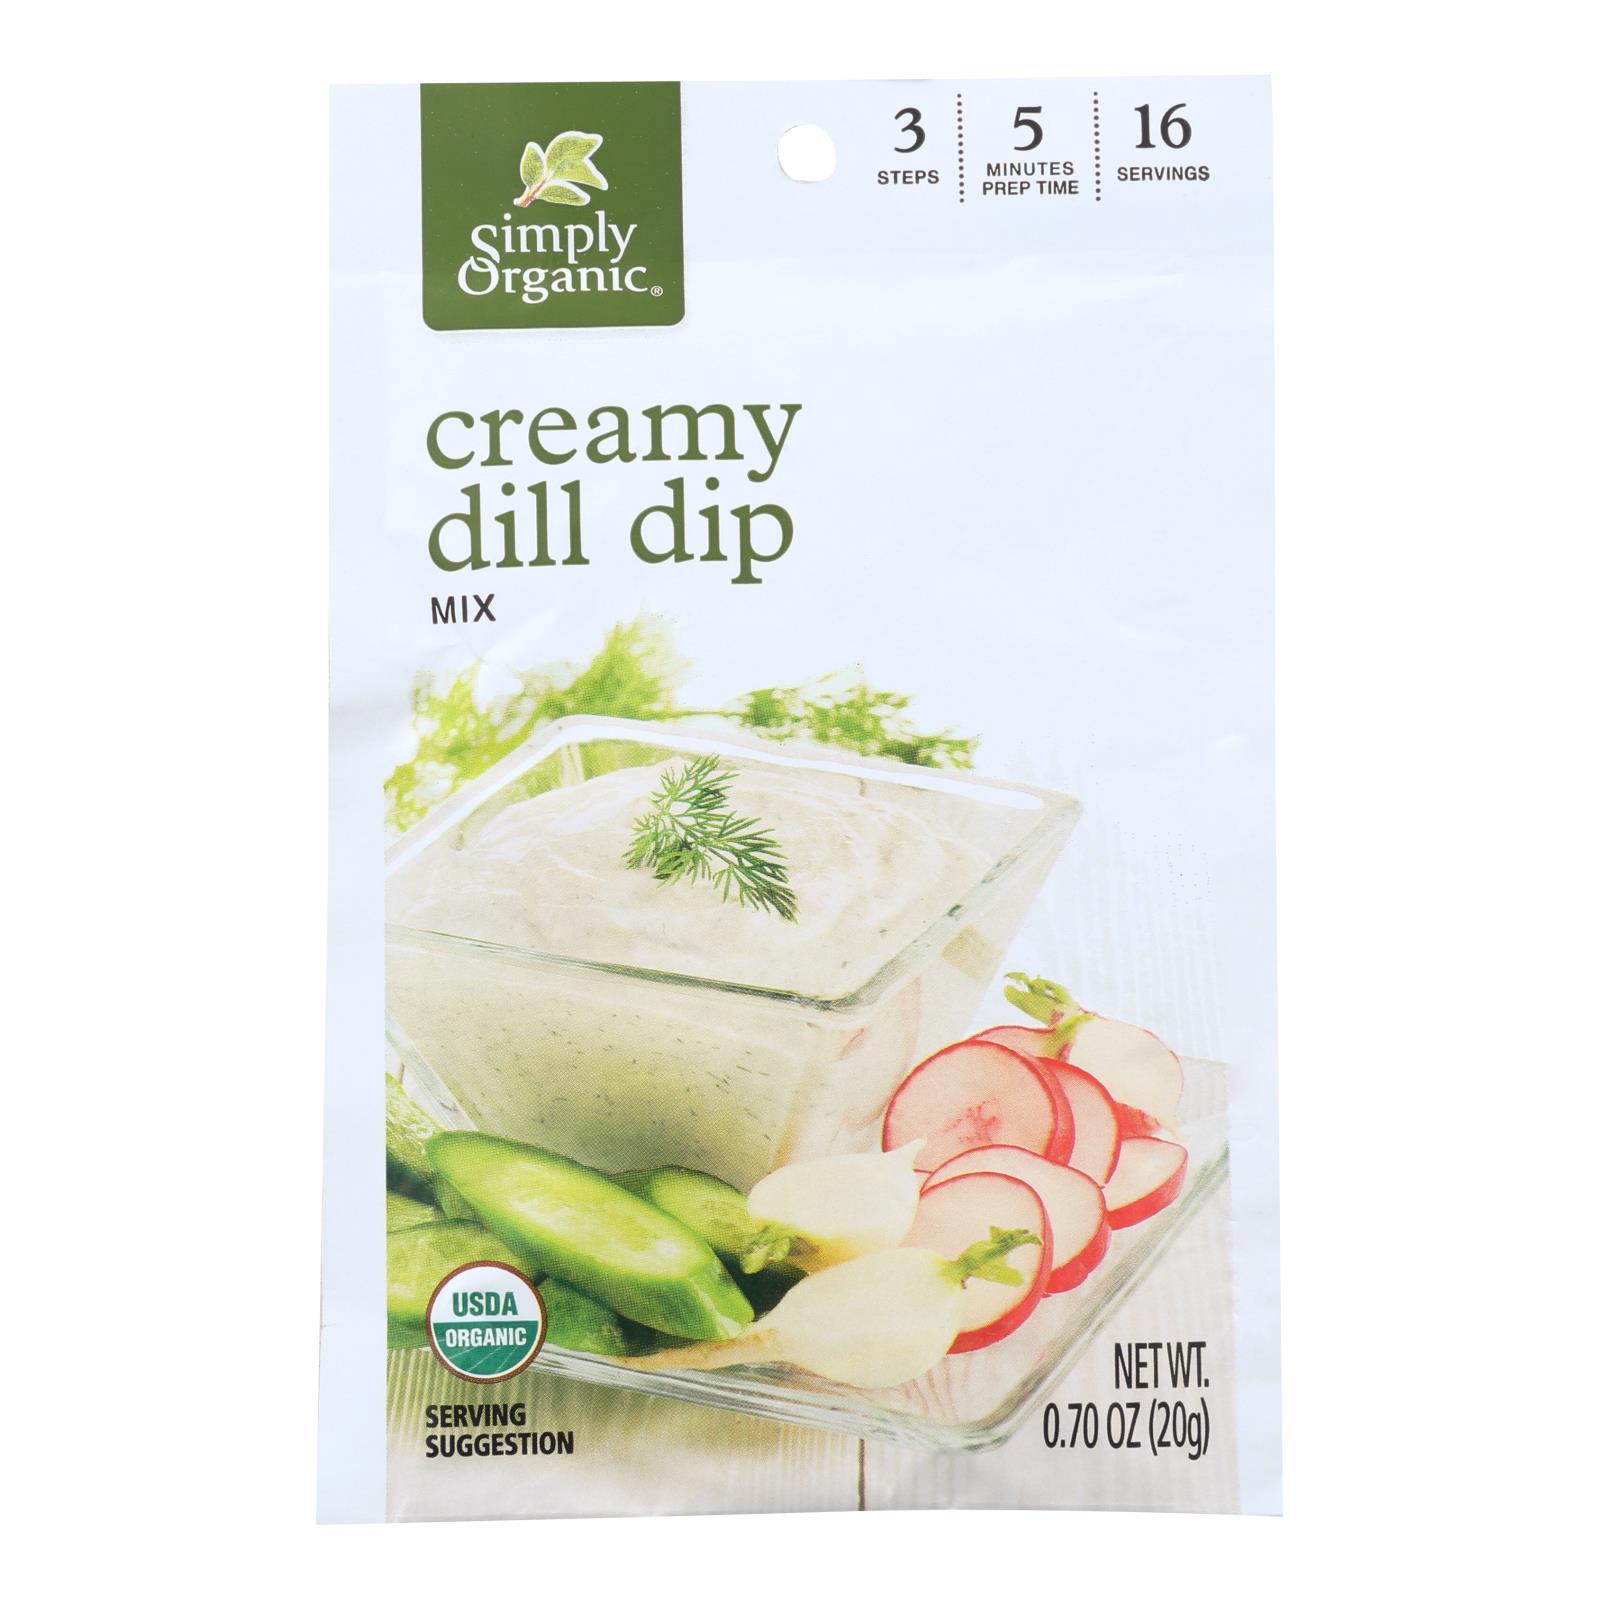 Simply Organic Creamy Dill Dip Mix - Case of 12 - 0.7 oz.